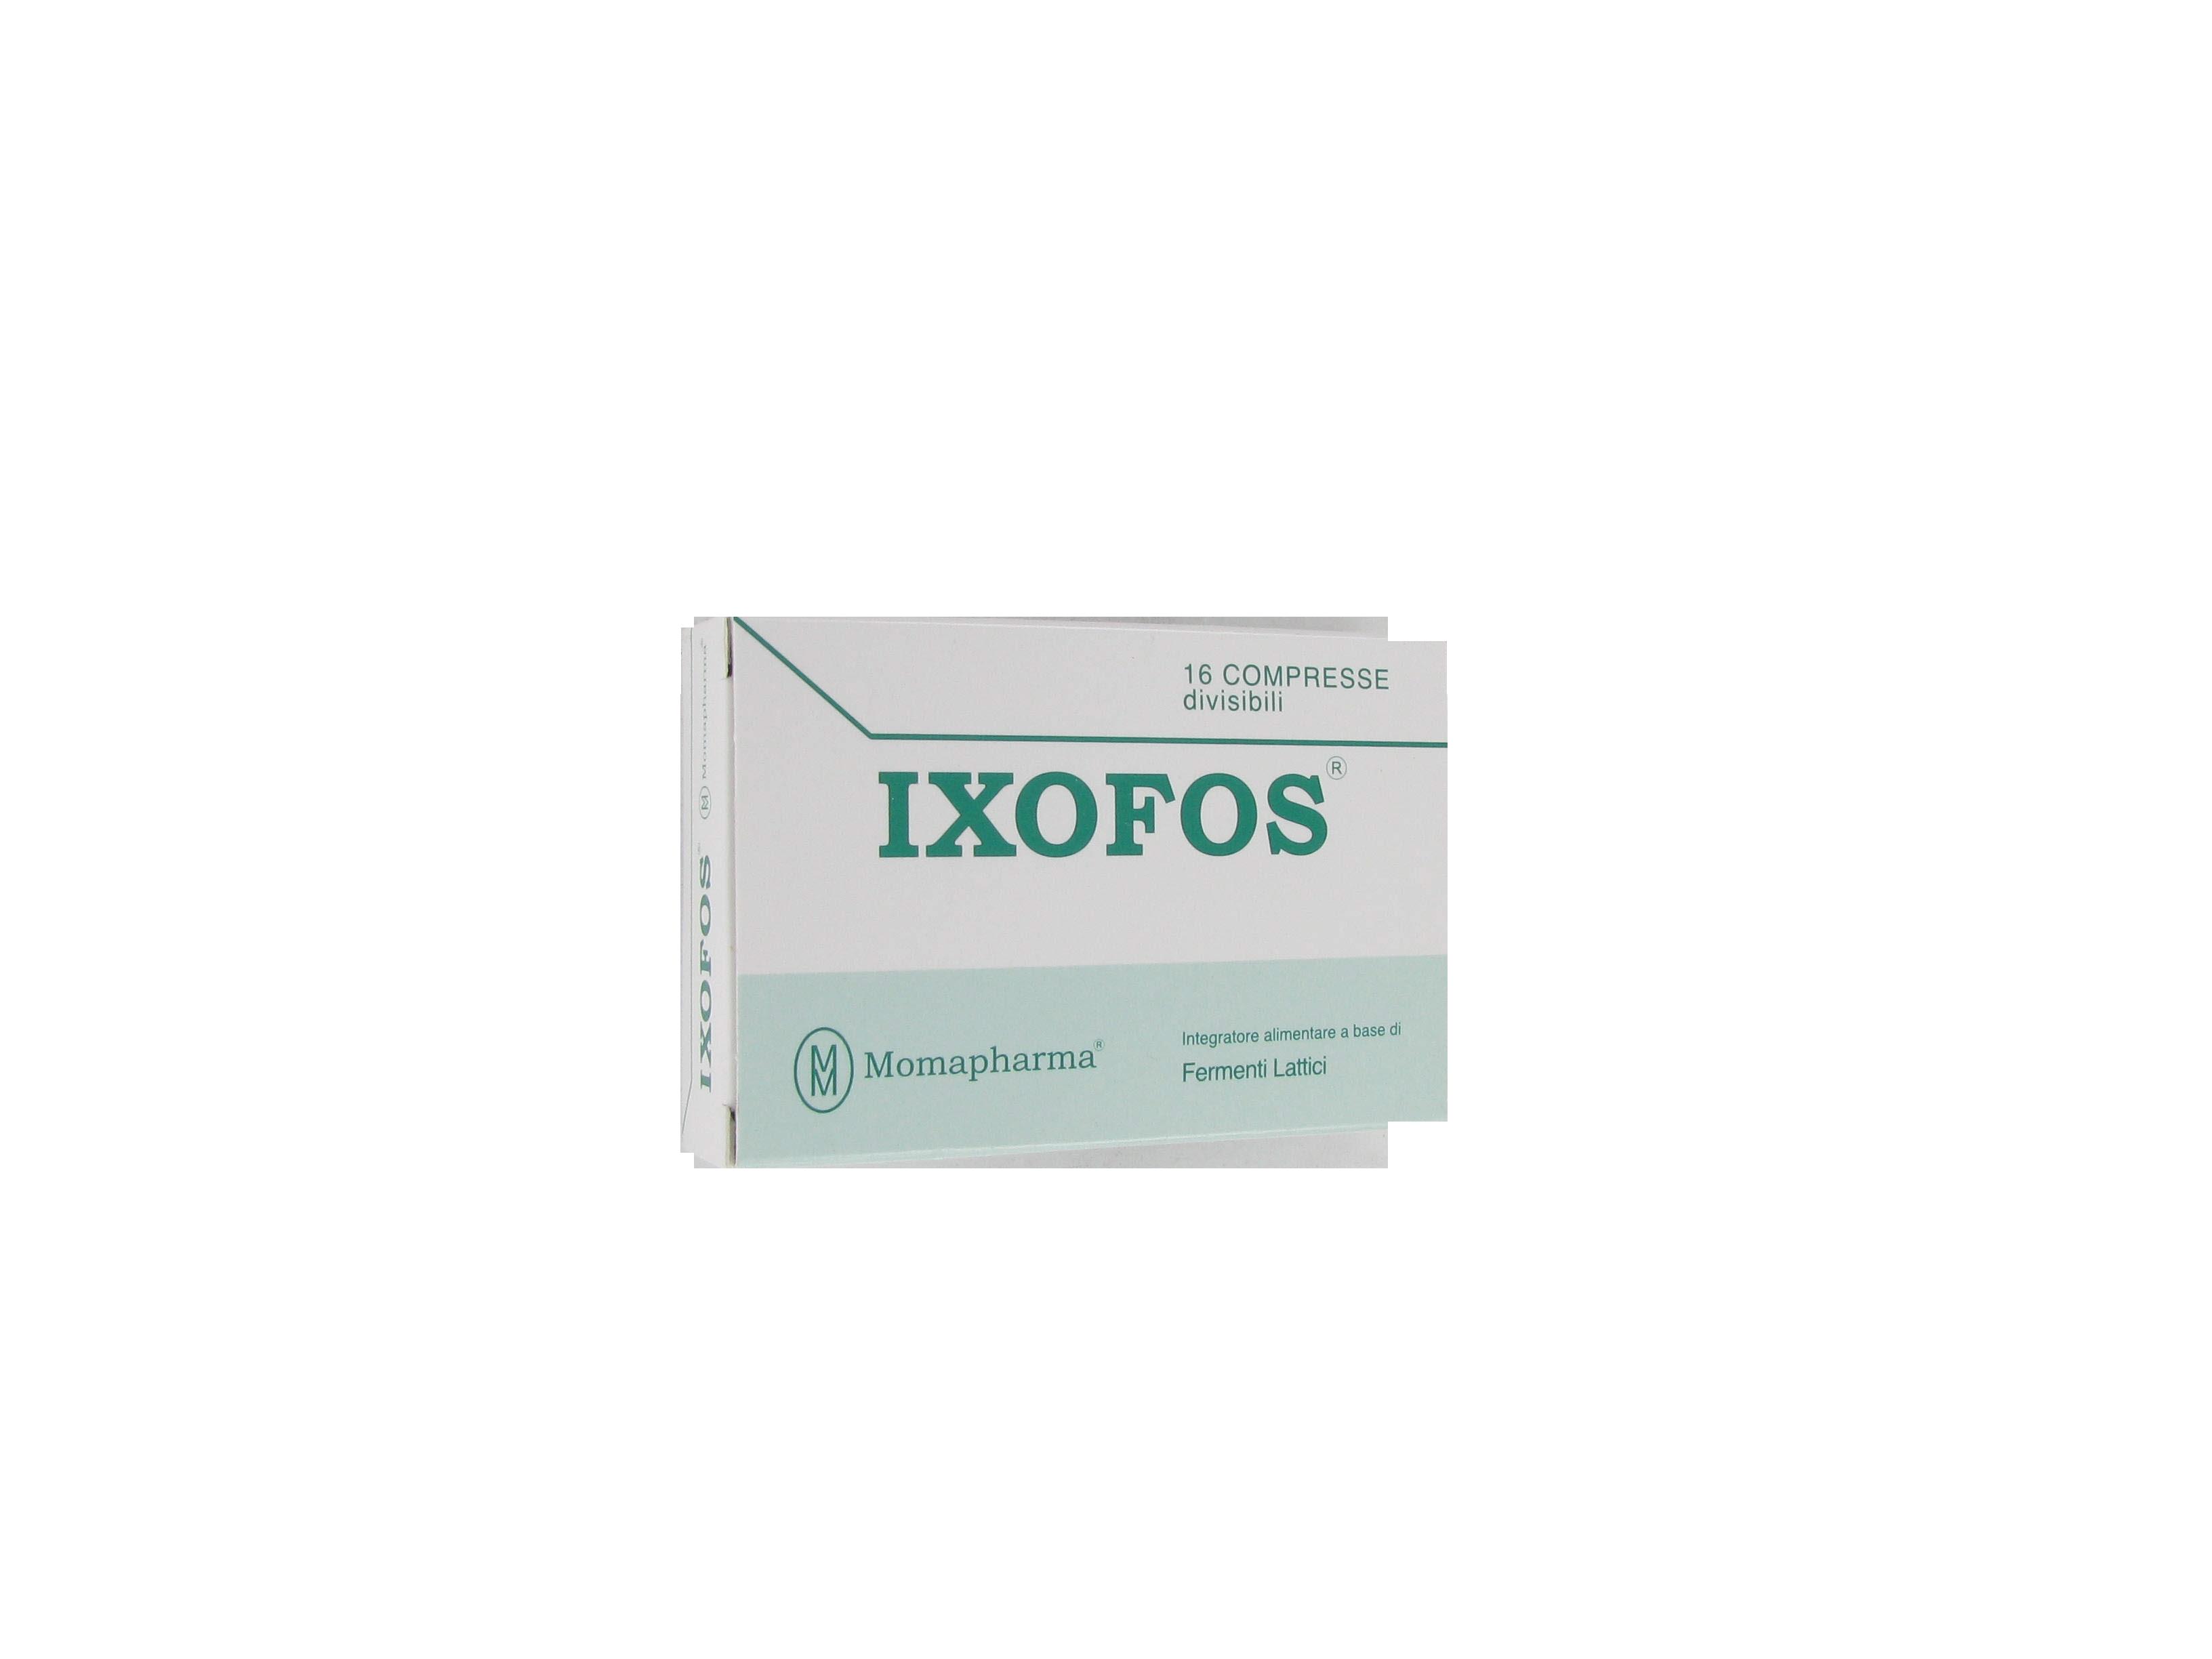 ixofos integratore alimentare